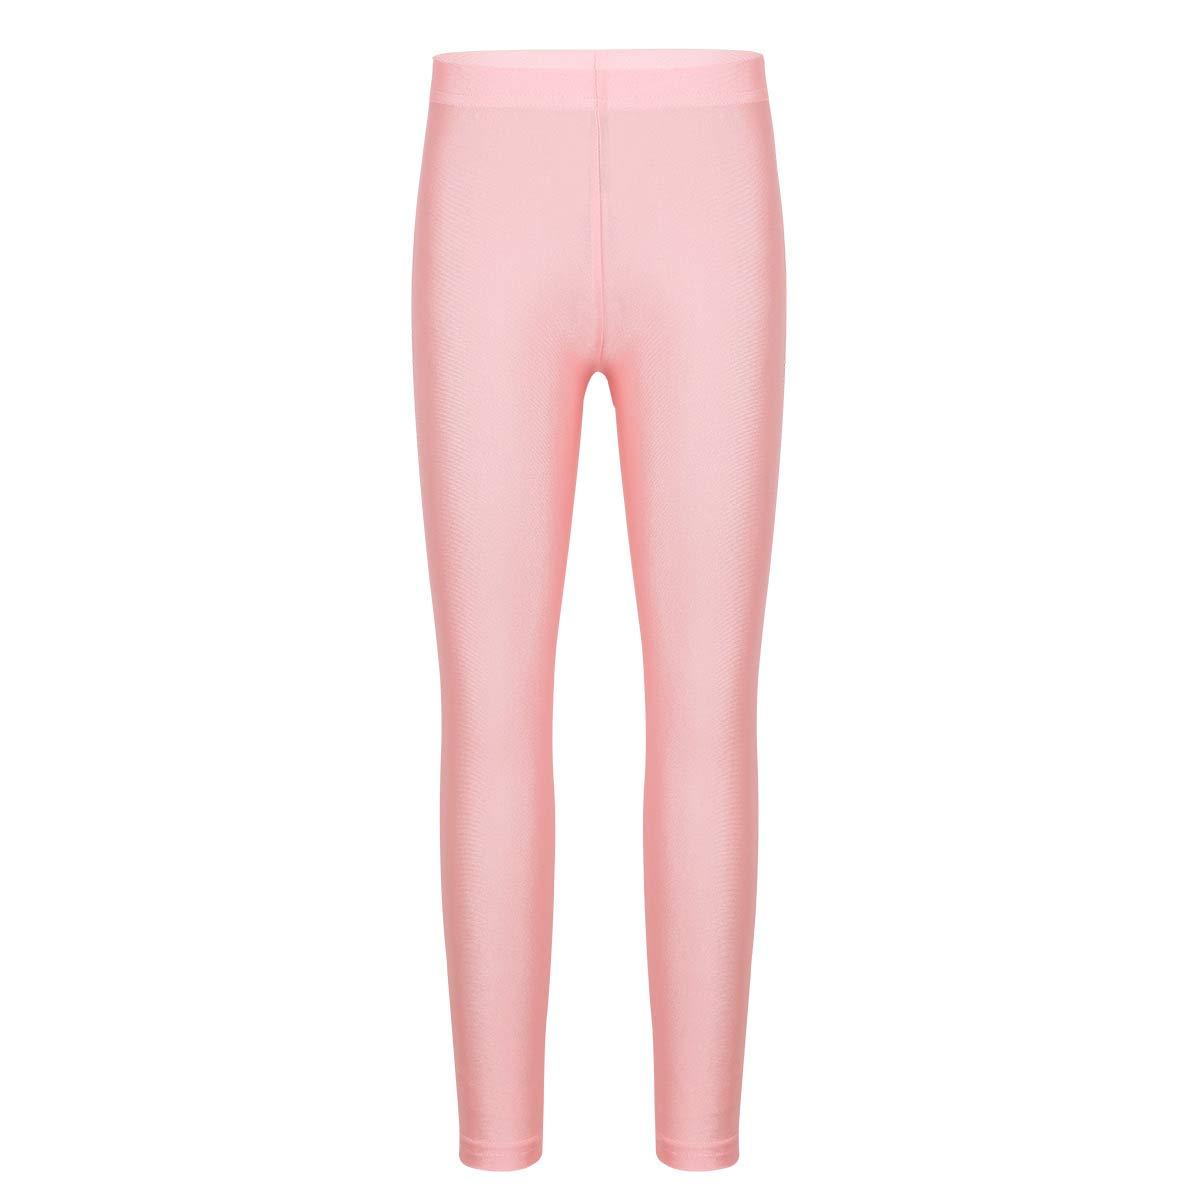 Freebily Boys Girls Stirrup Pantyhose Stockings Leggings Tights for Yoga Gymnastics Ballet Dance Pink (Ankle Length) 6-7